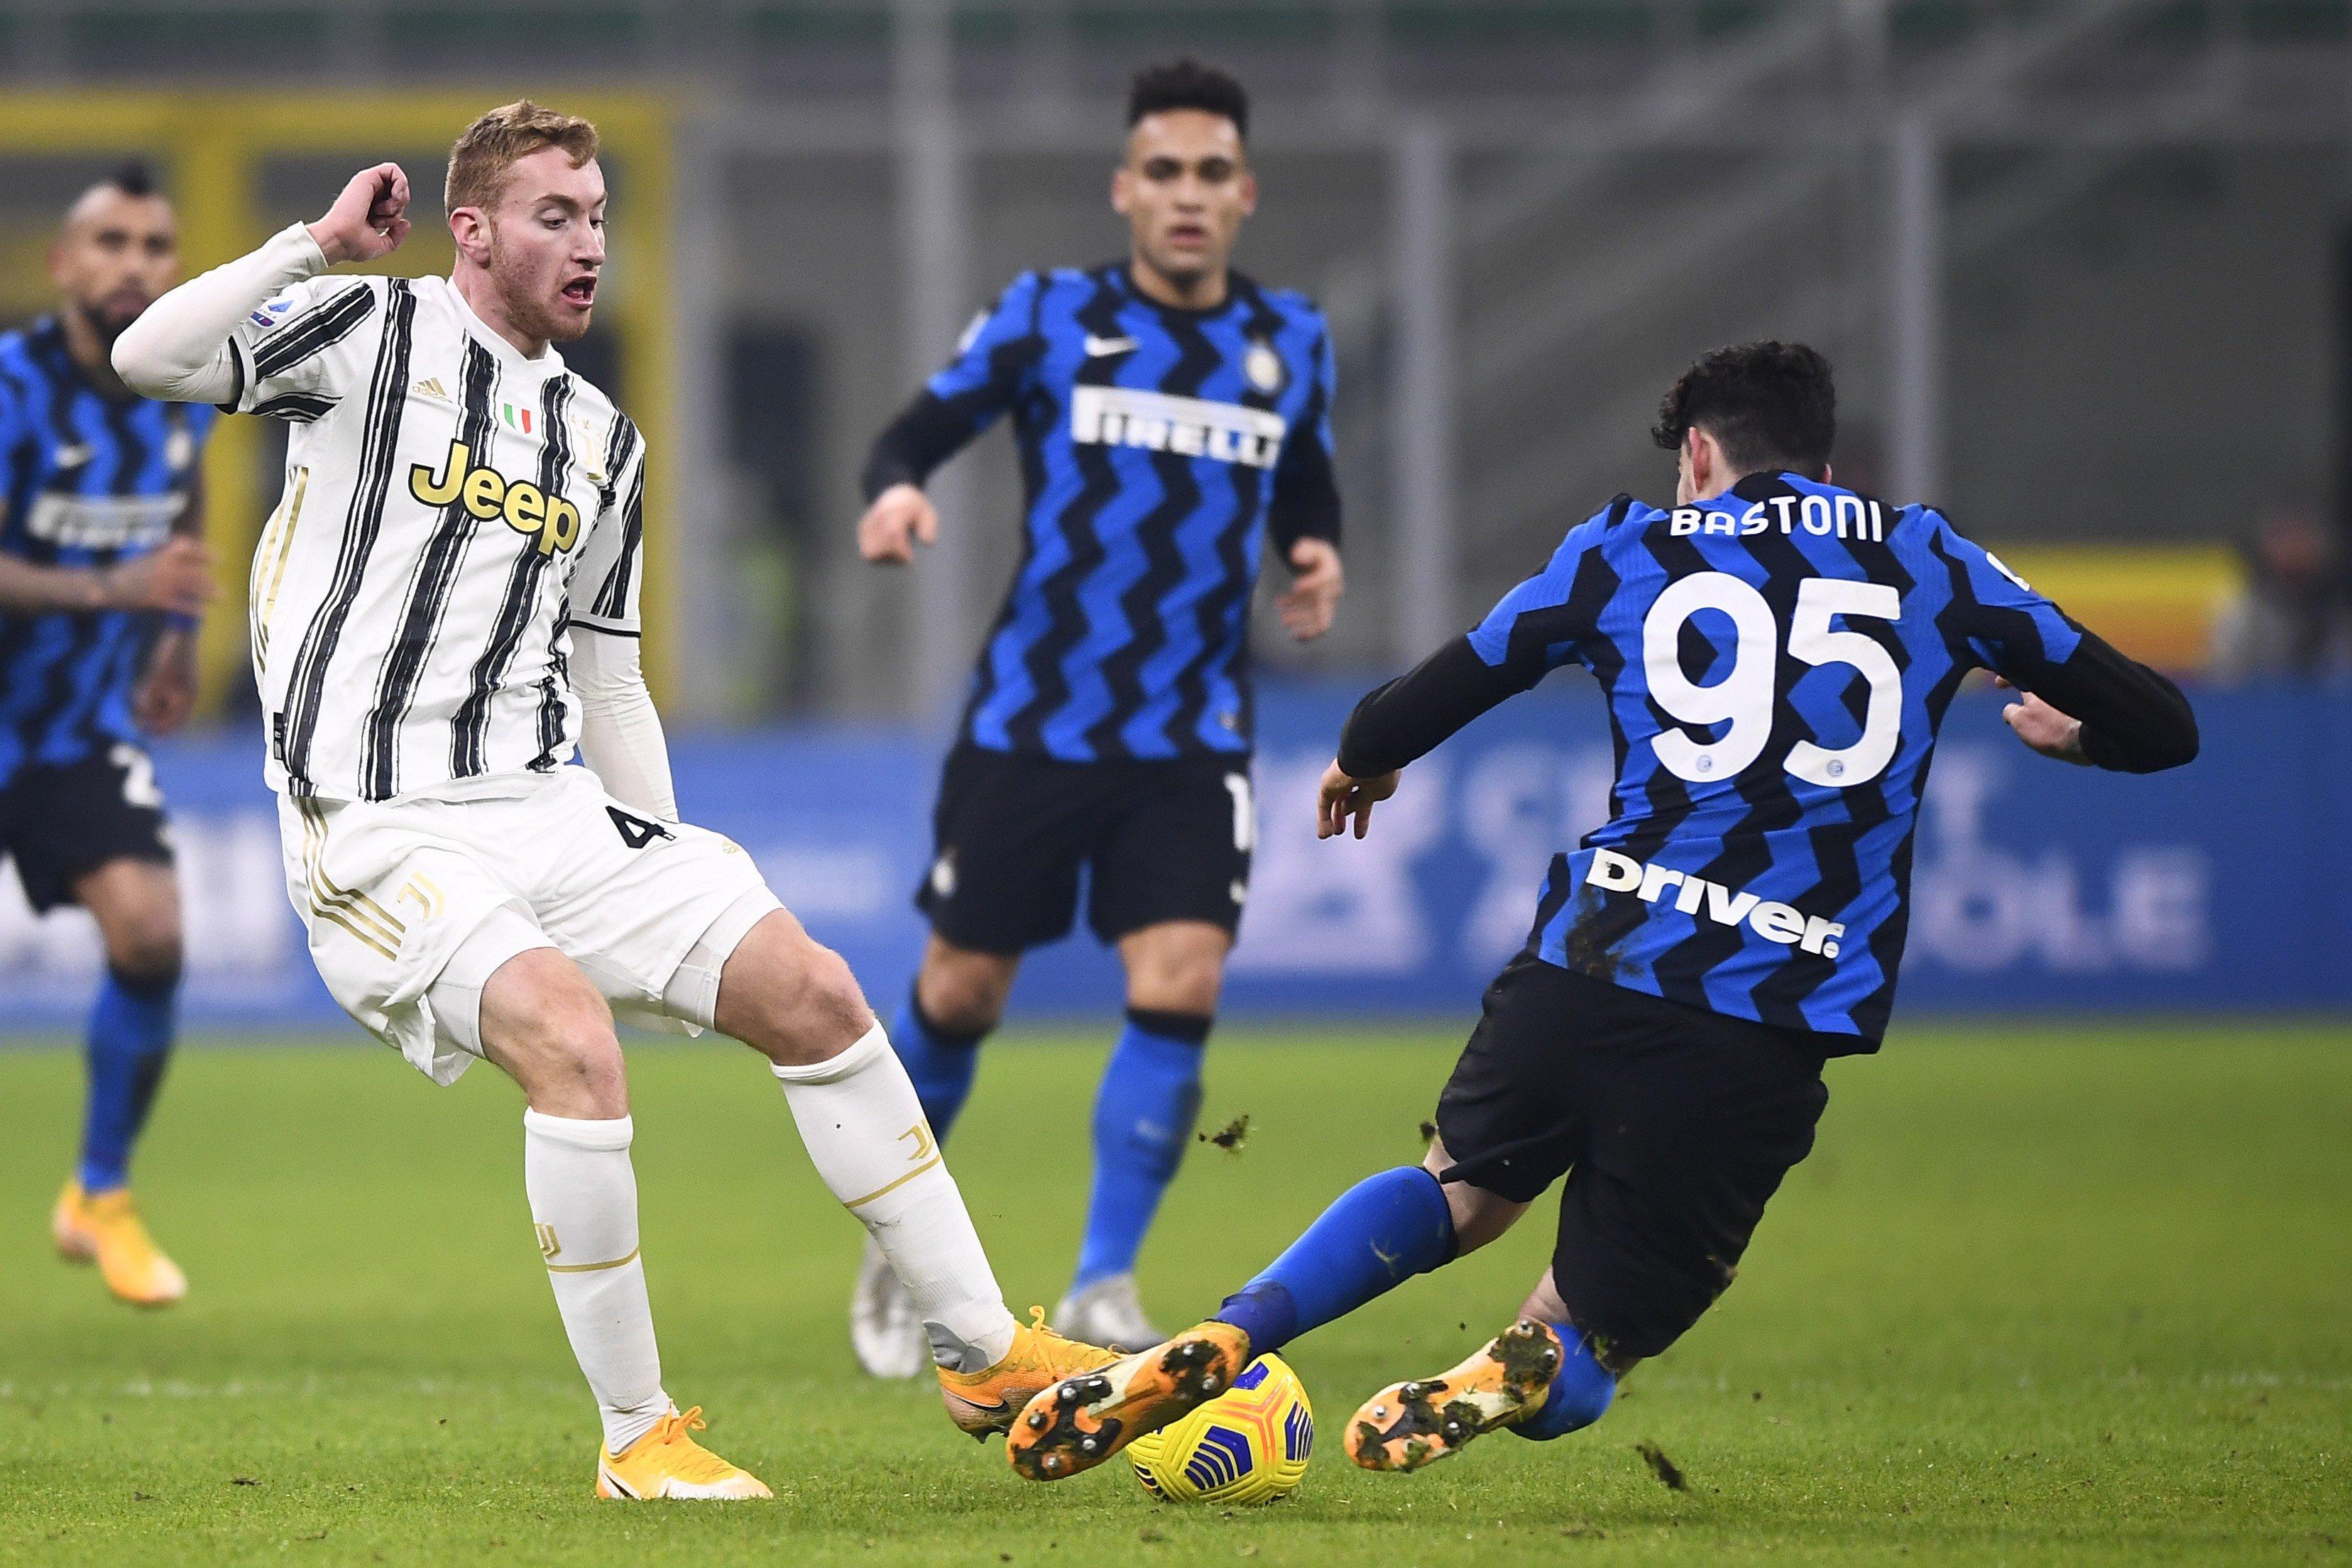 Inter-Juve, i tifosi bianconeri si godono la rivincita: quanti sfottò |  Sport e Vai